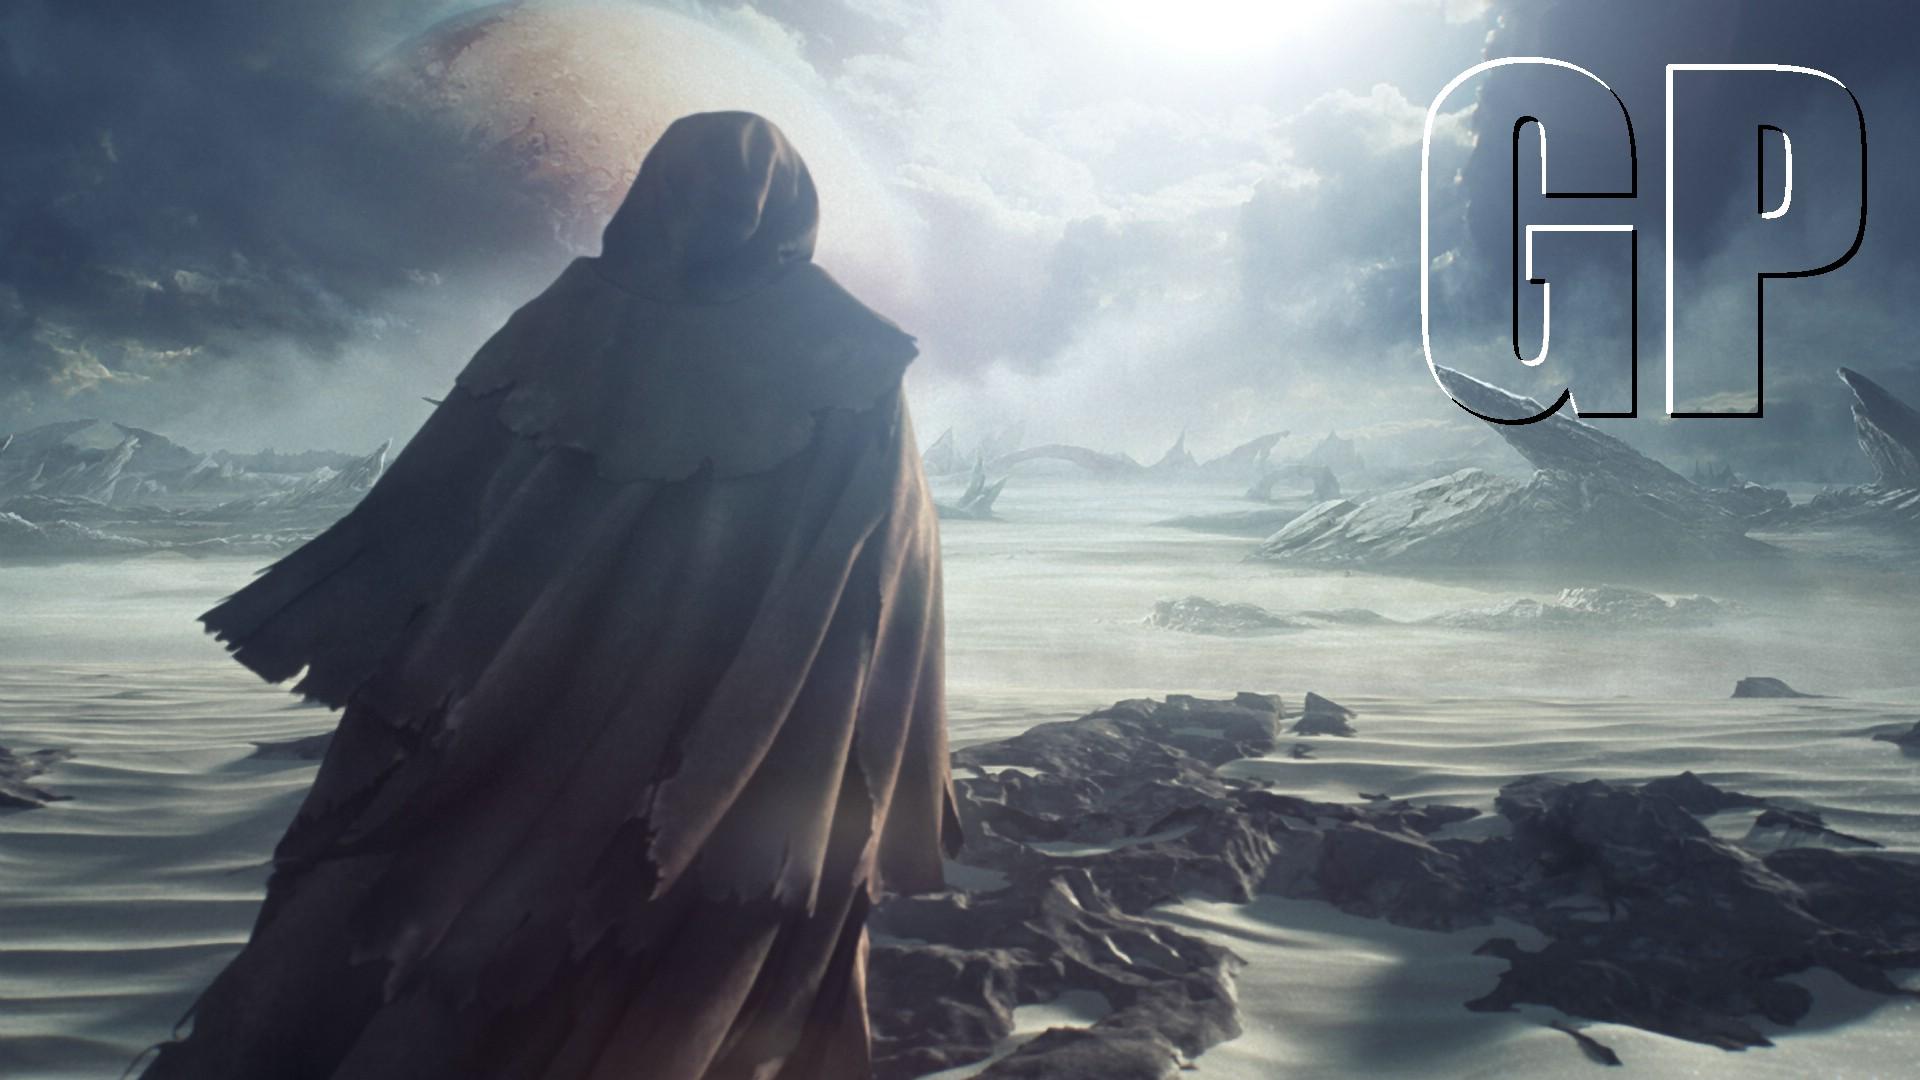 Halo 5 Xbox One Trailer, Screenshots: Master Chief In The Desert #27109